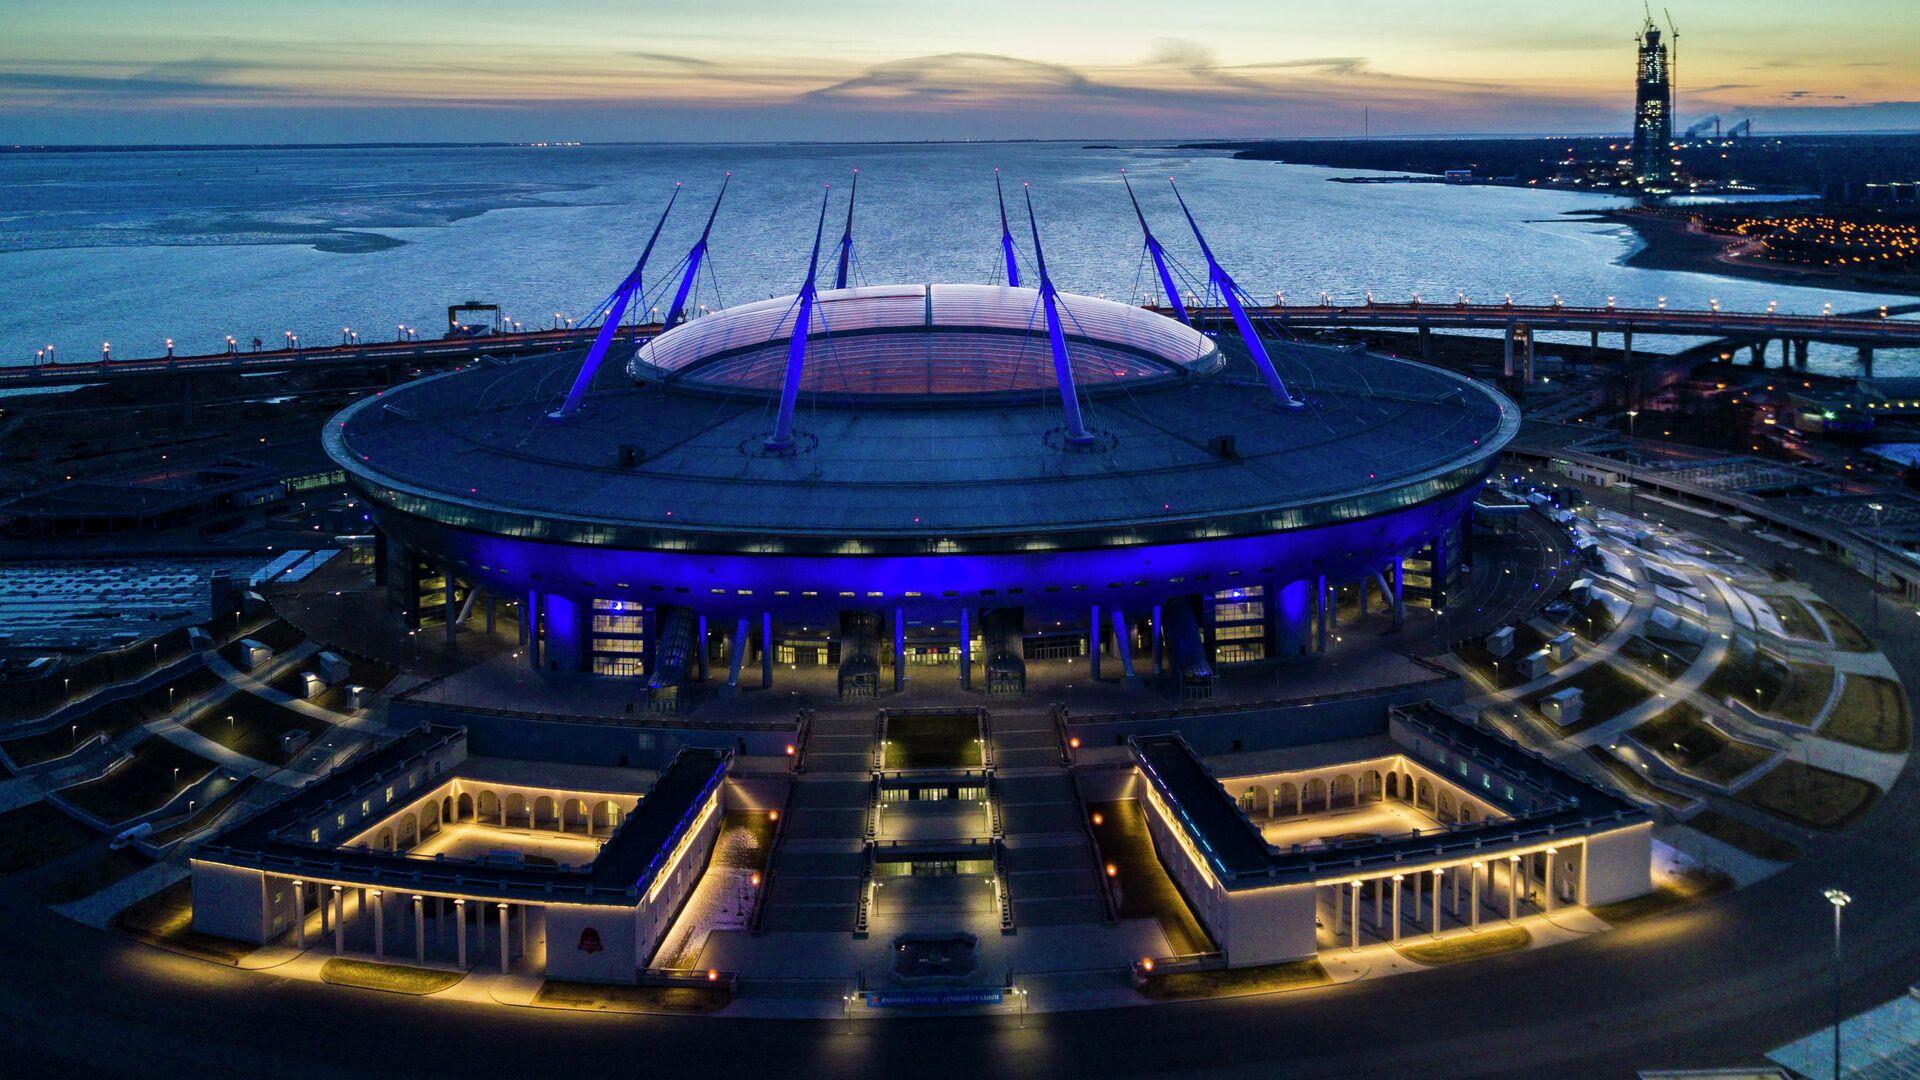 Стадион Санкт-Петербург Арена - РИА Новости, 1920, 30.04.2021